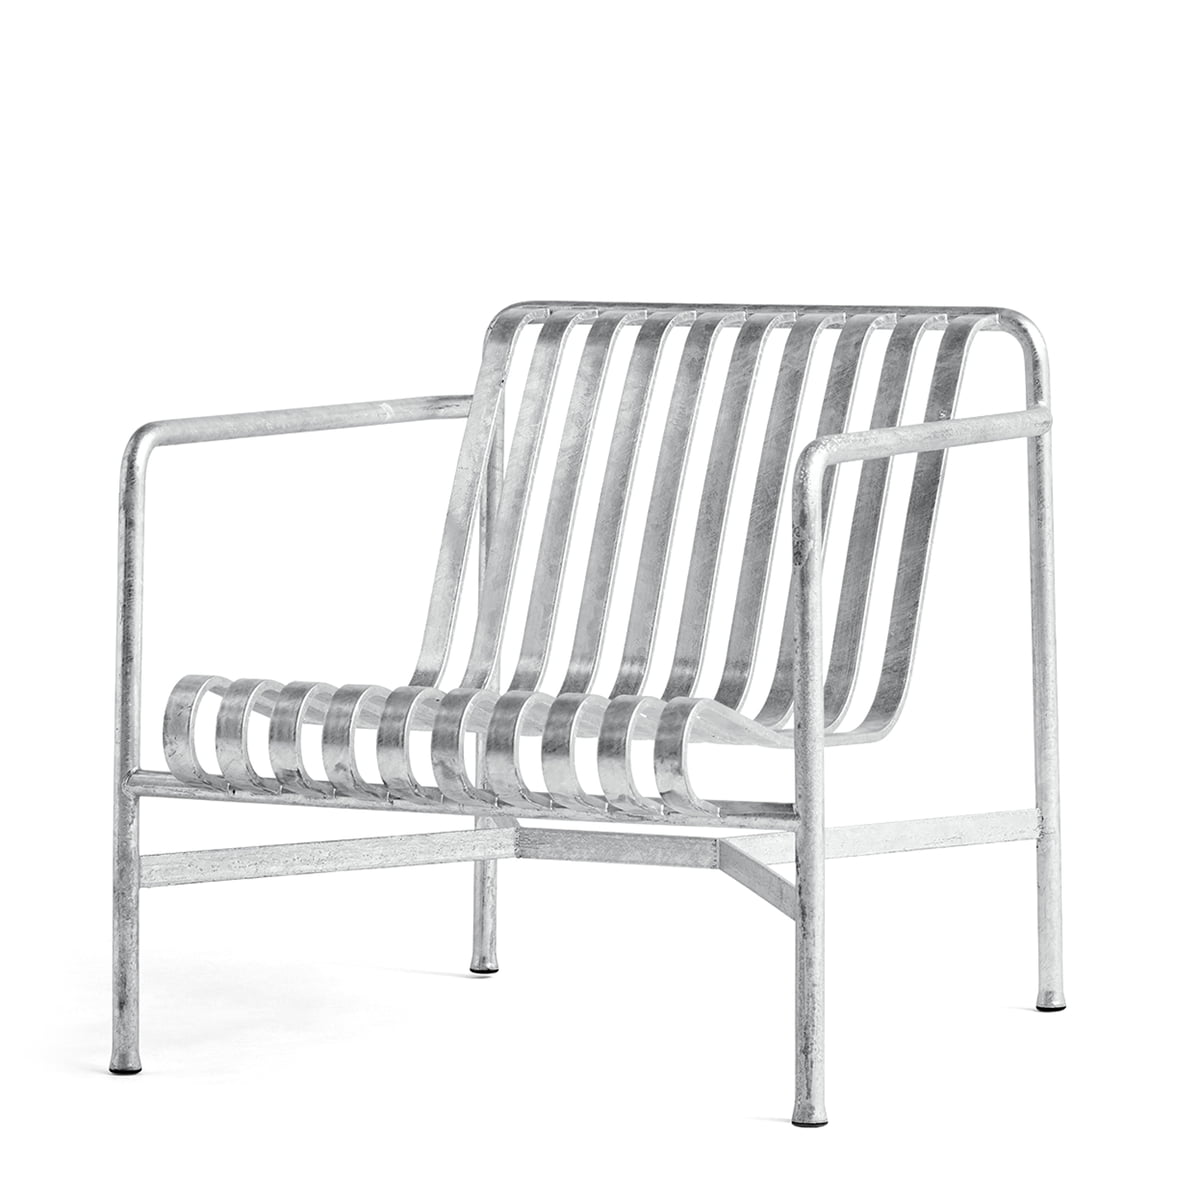 Hay - Palissade Lounge Chair low, hot galvanised   Wohnzimmer > Sessel > Loungesessel   Galvanisierter stahl   Hay